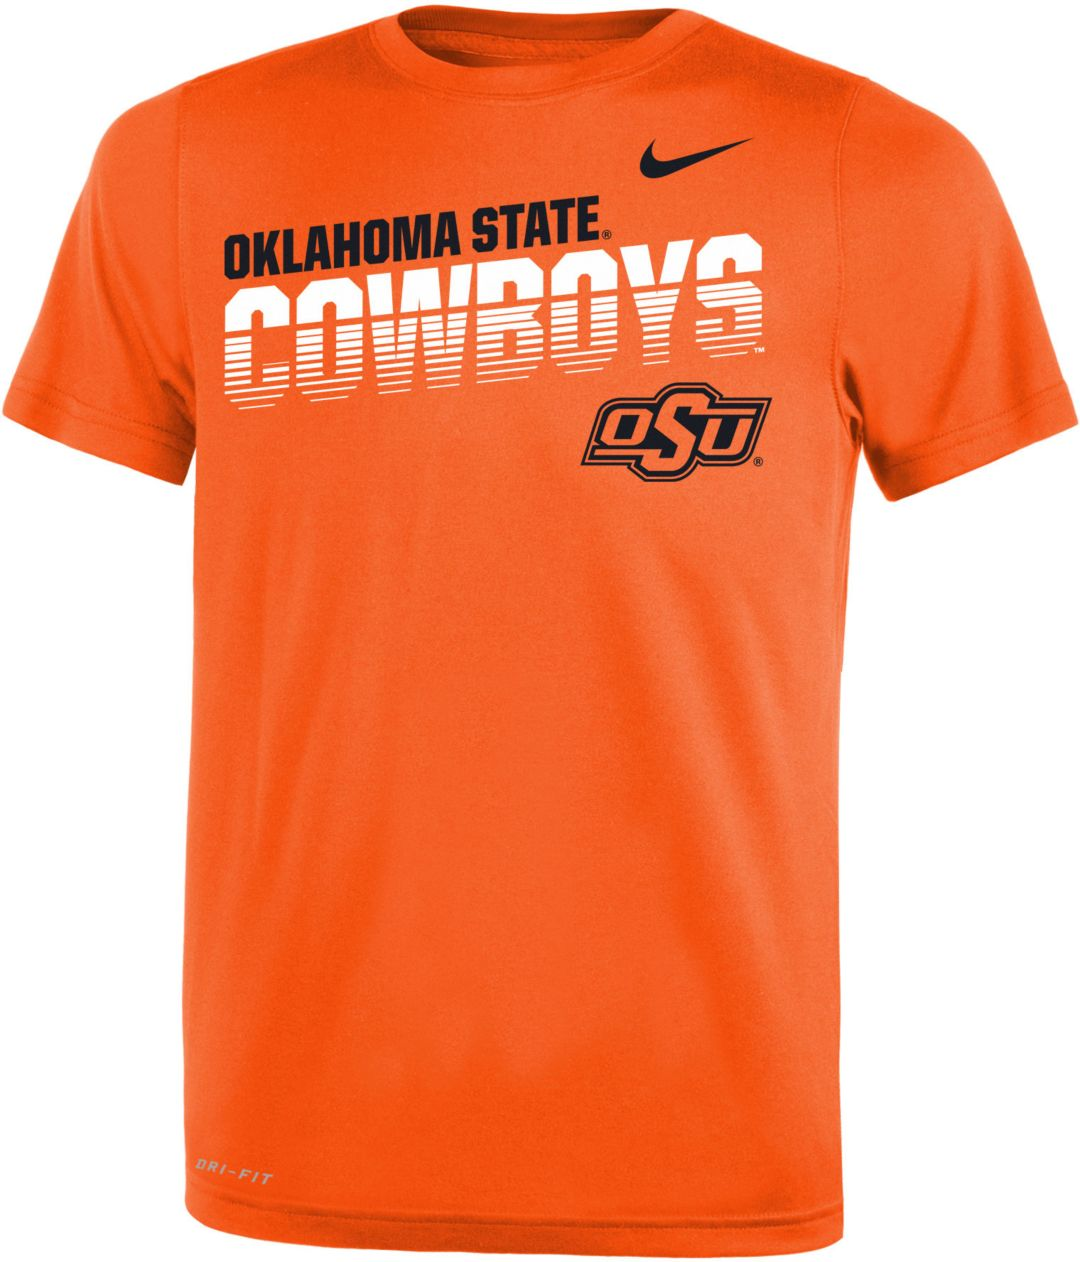 free shipping 157a7 006f8 Nike Youth Oklahoma State Cowboys Orange Legend Football Sideline T-Shirt